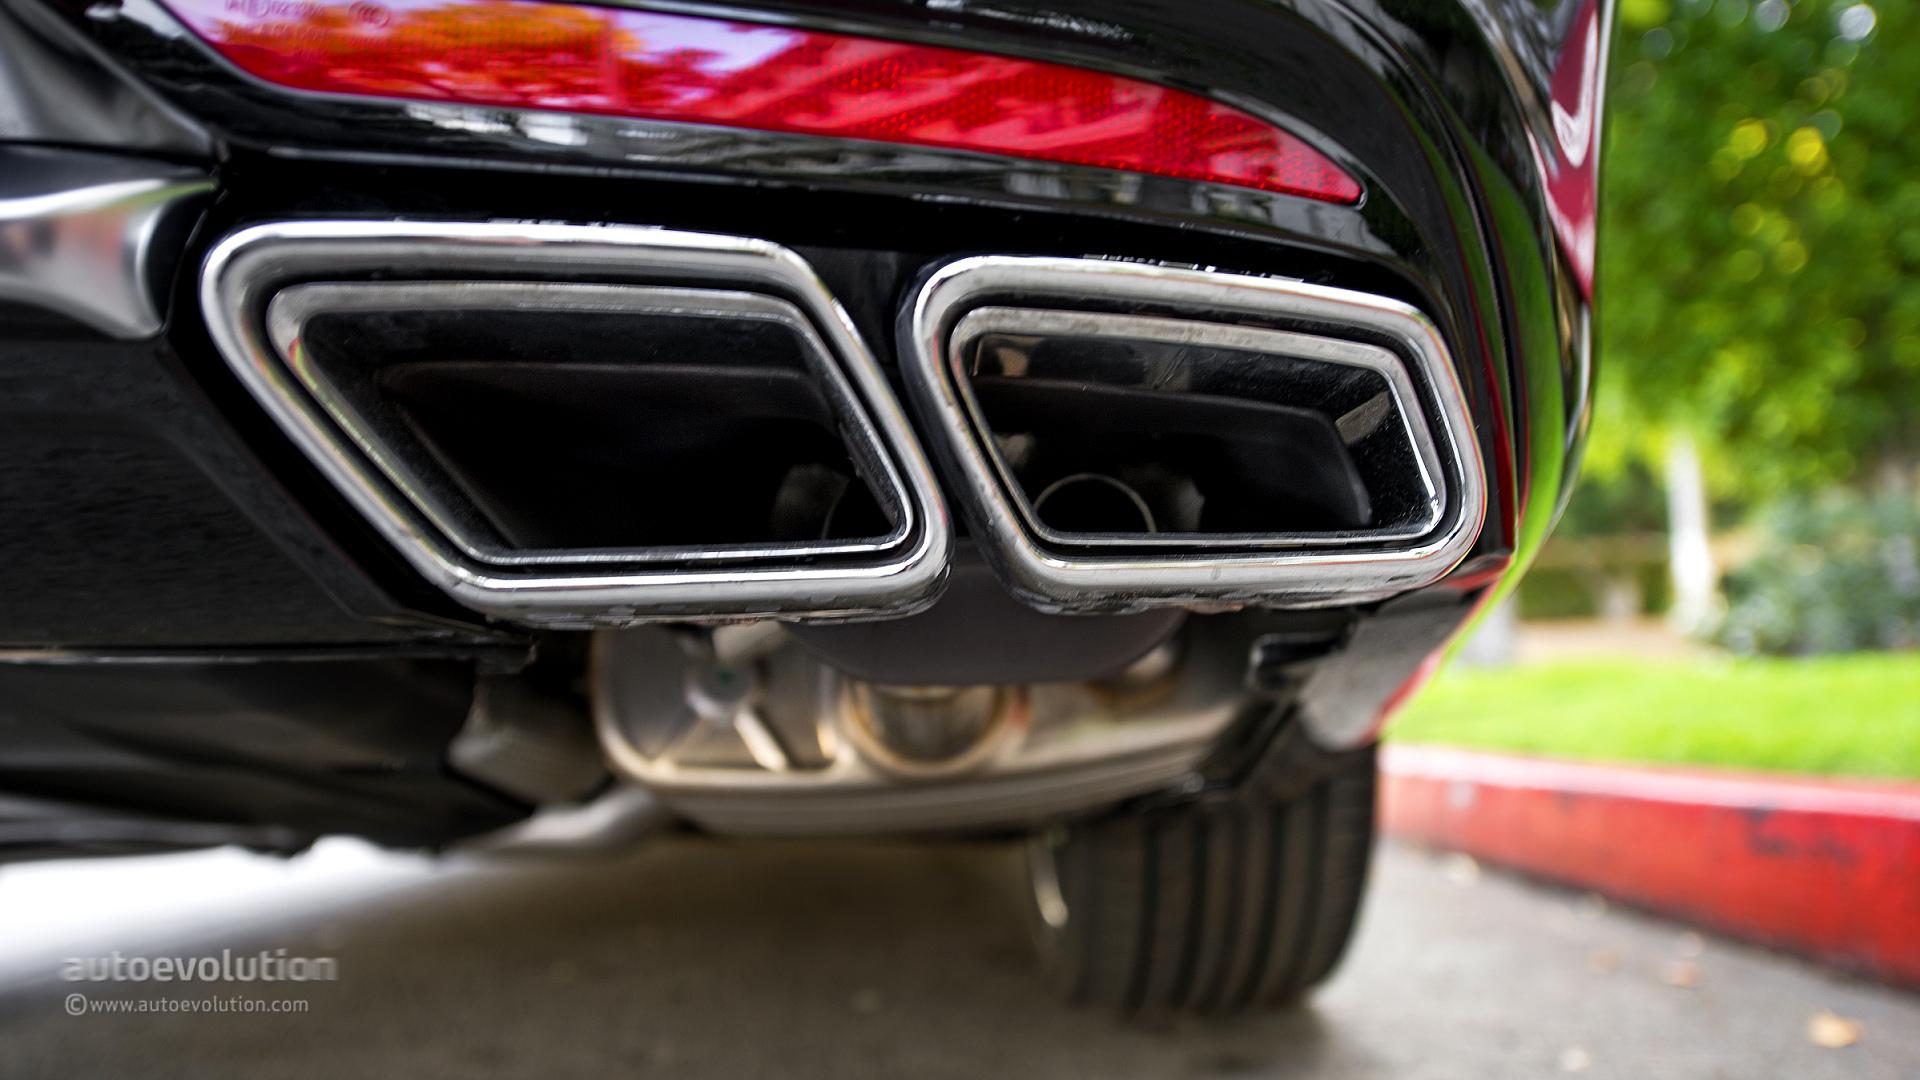 Mercedes Benz S63 Amg 4matic Review Autoevolution